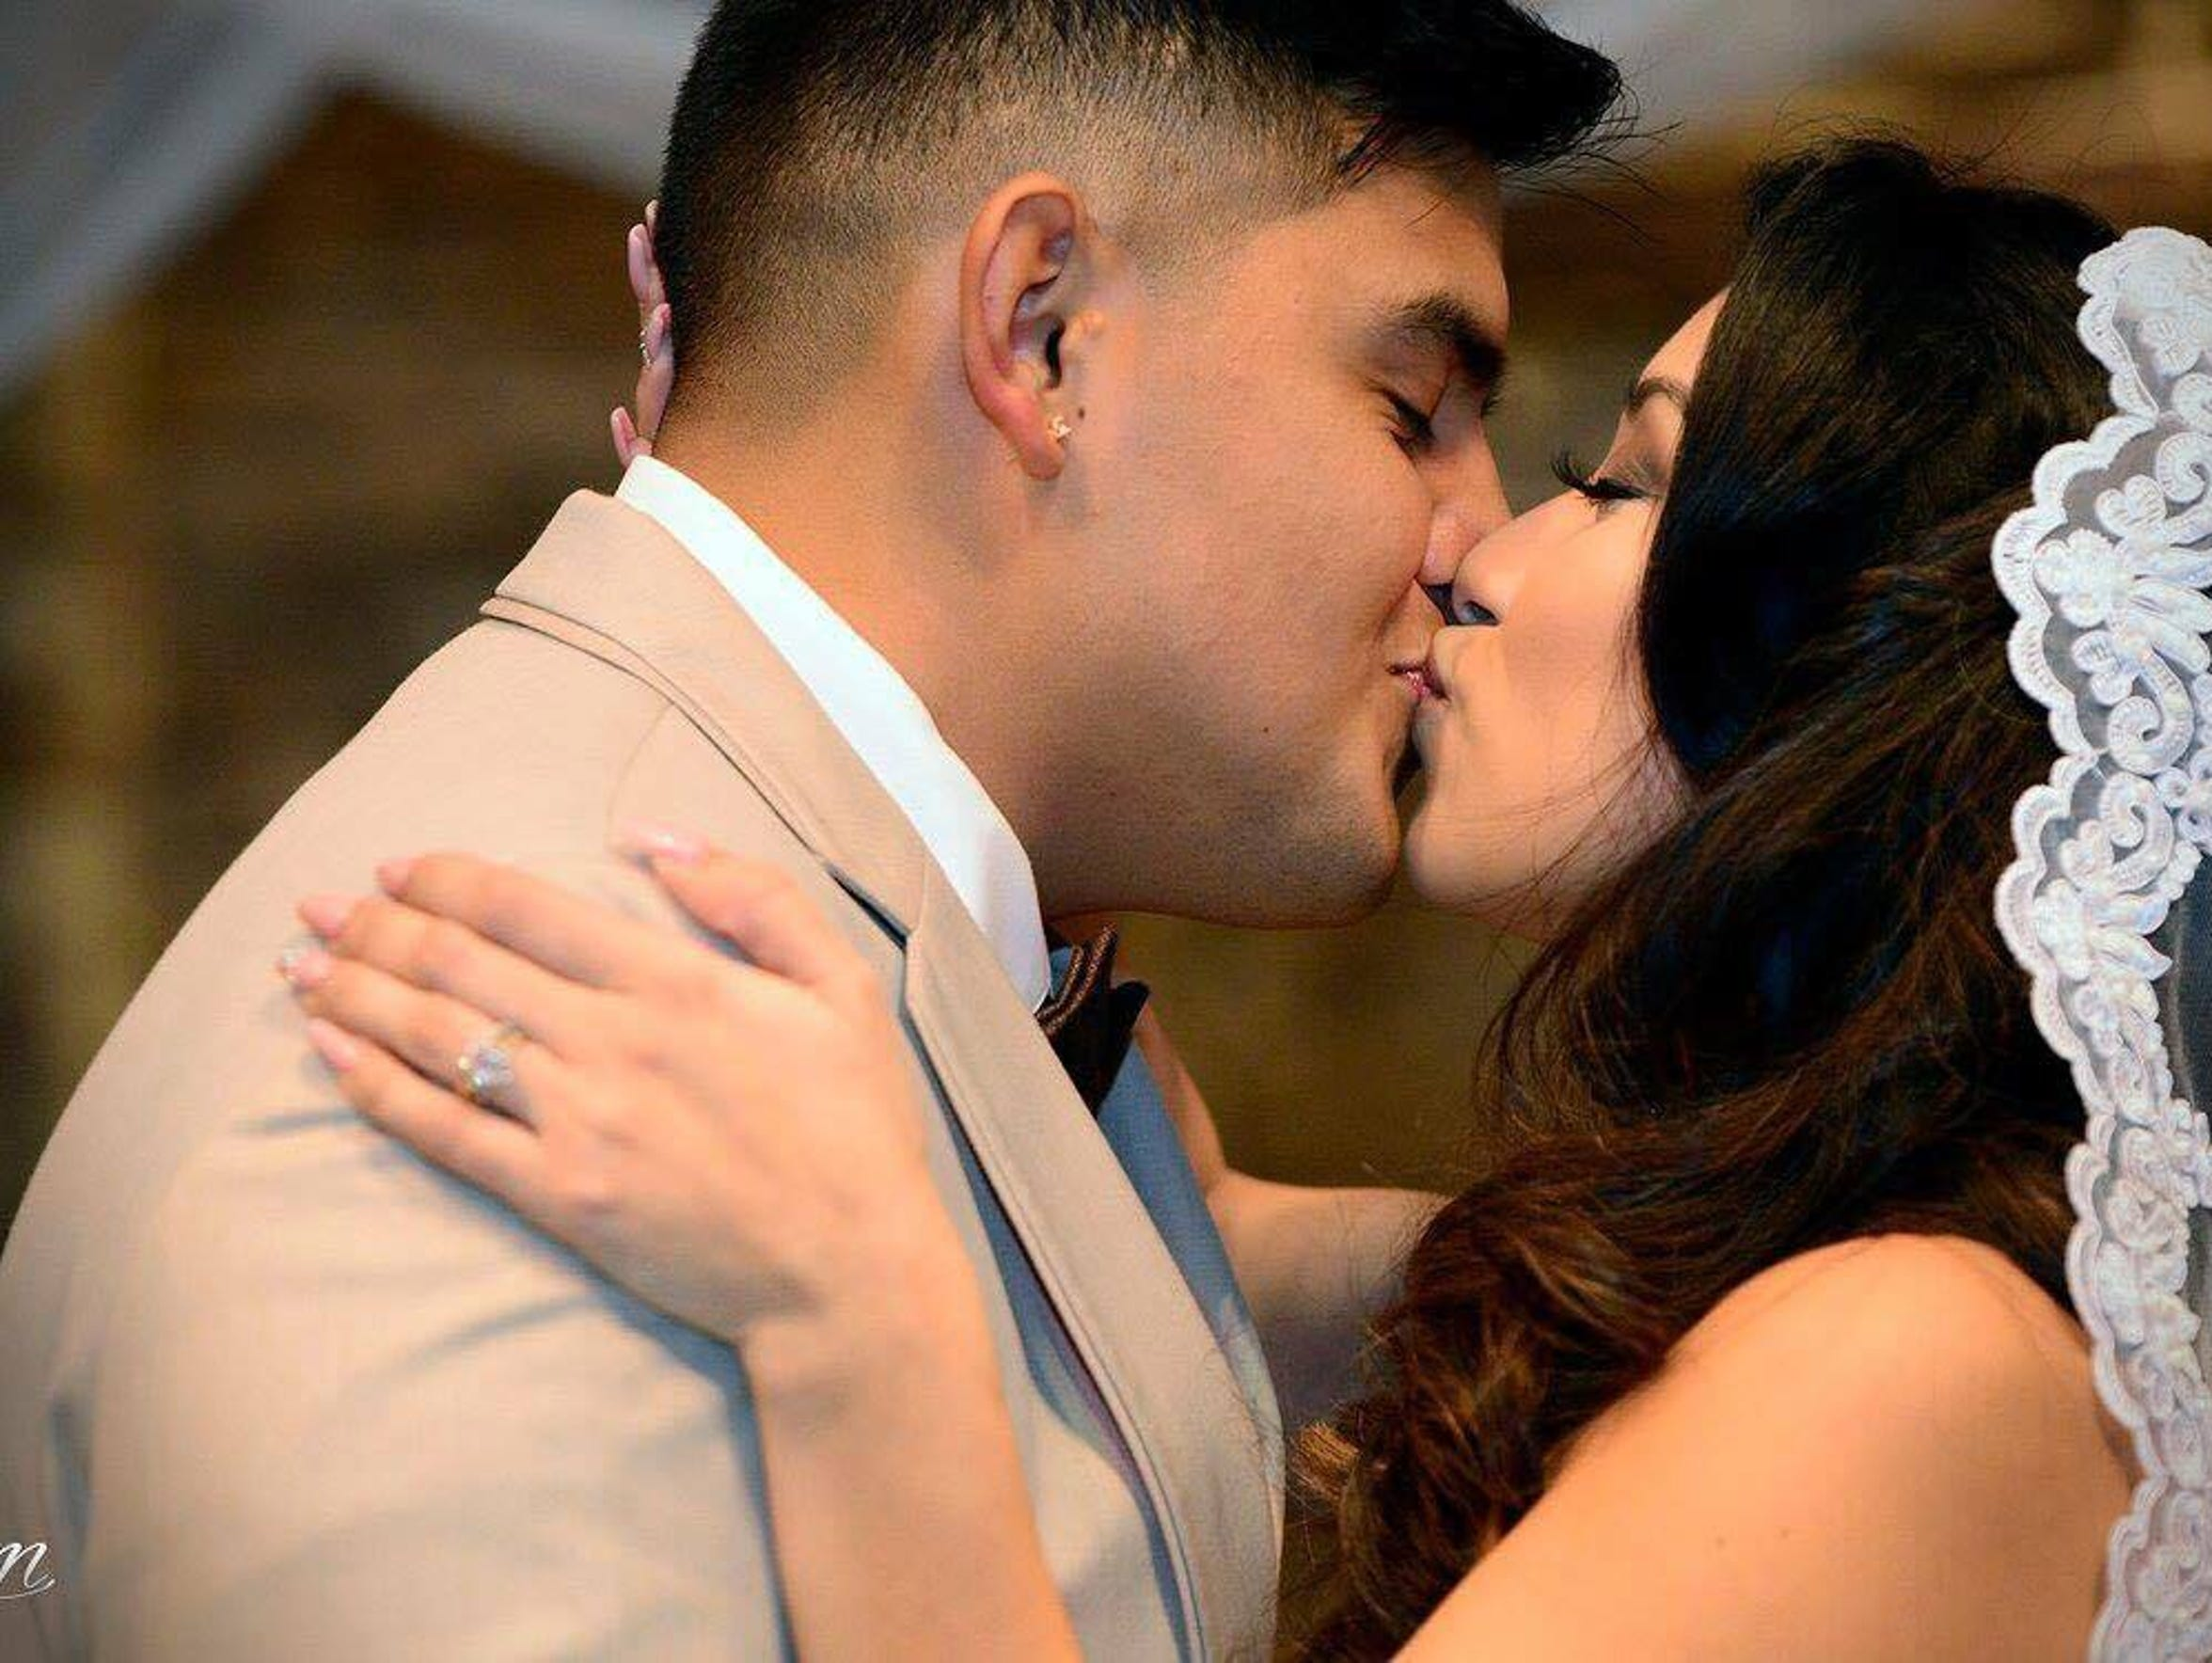 Despite tragedy, Kristian Guerrero finds strength through